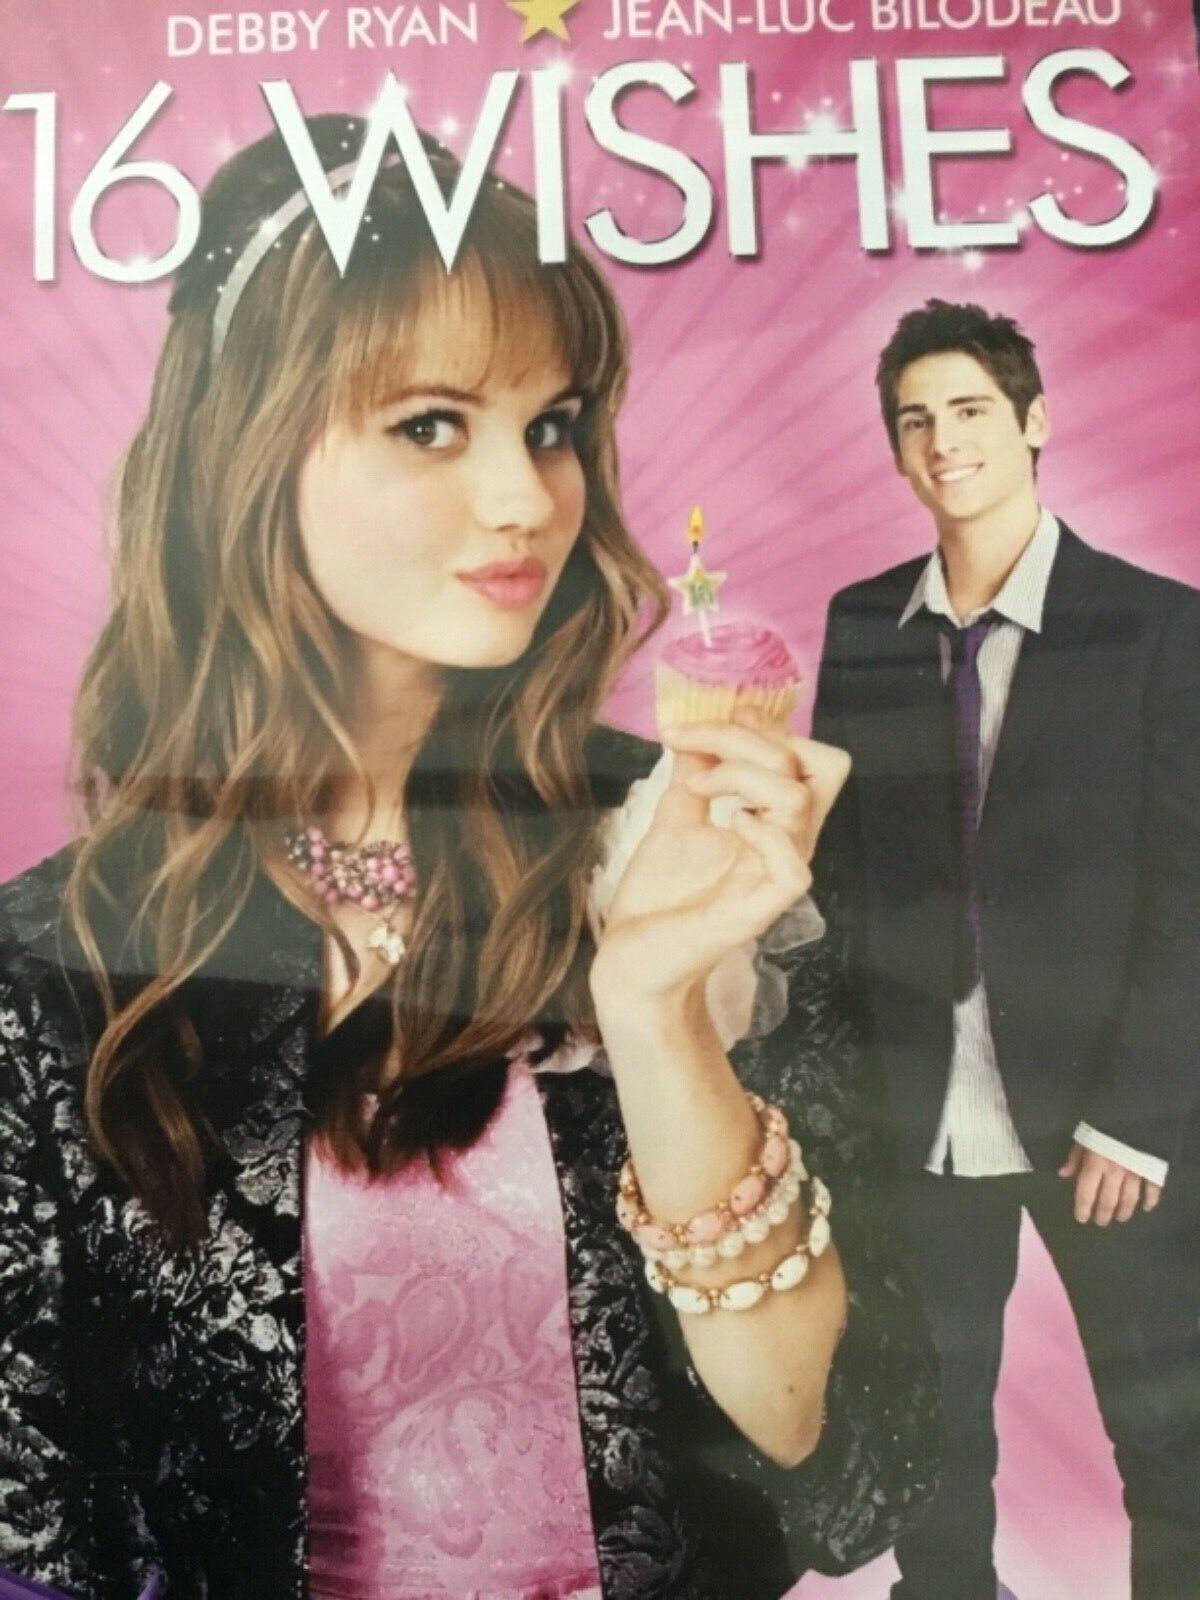 16 Wishes DVD Movie Starring Debby Ryan, Jean-Luc Bilodeau